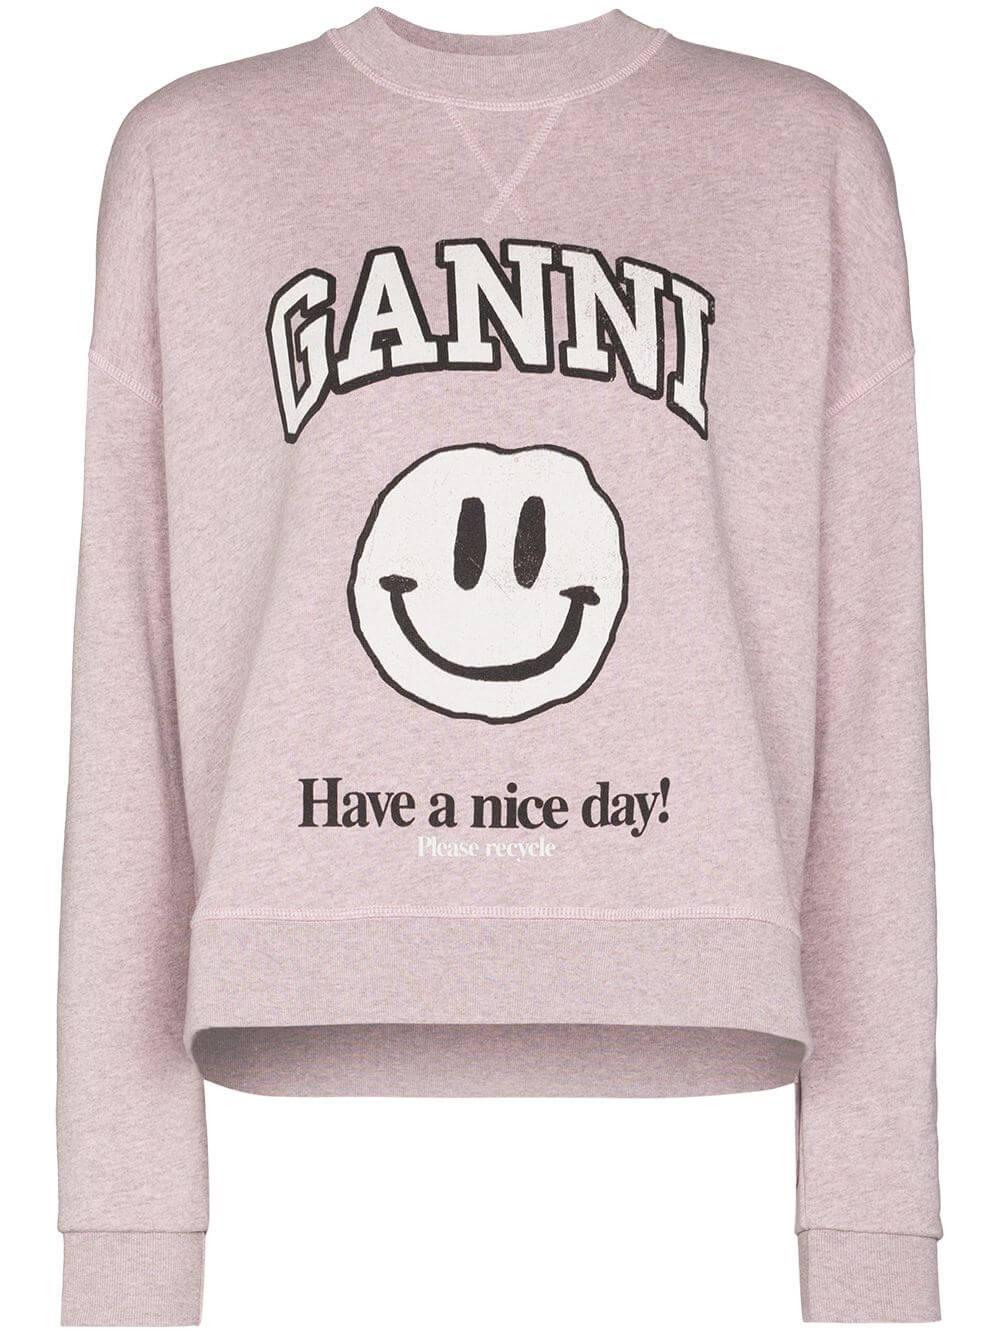 Isoli Smiley Face Sweatshirt Item # T2747